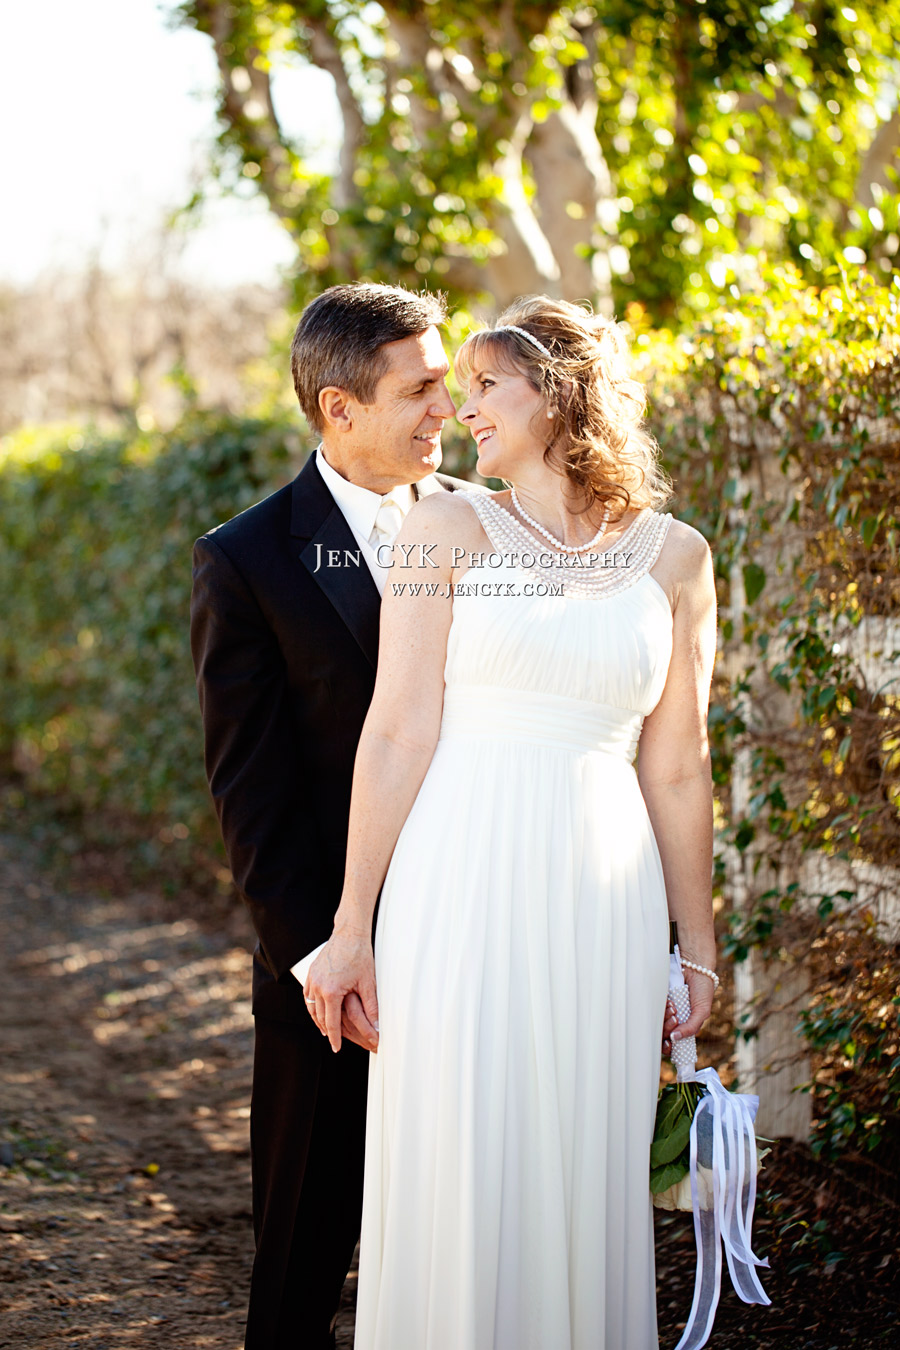 Orange County Intimate Wedding Photographer (5)